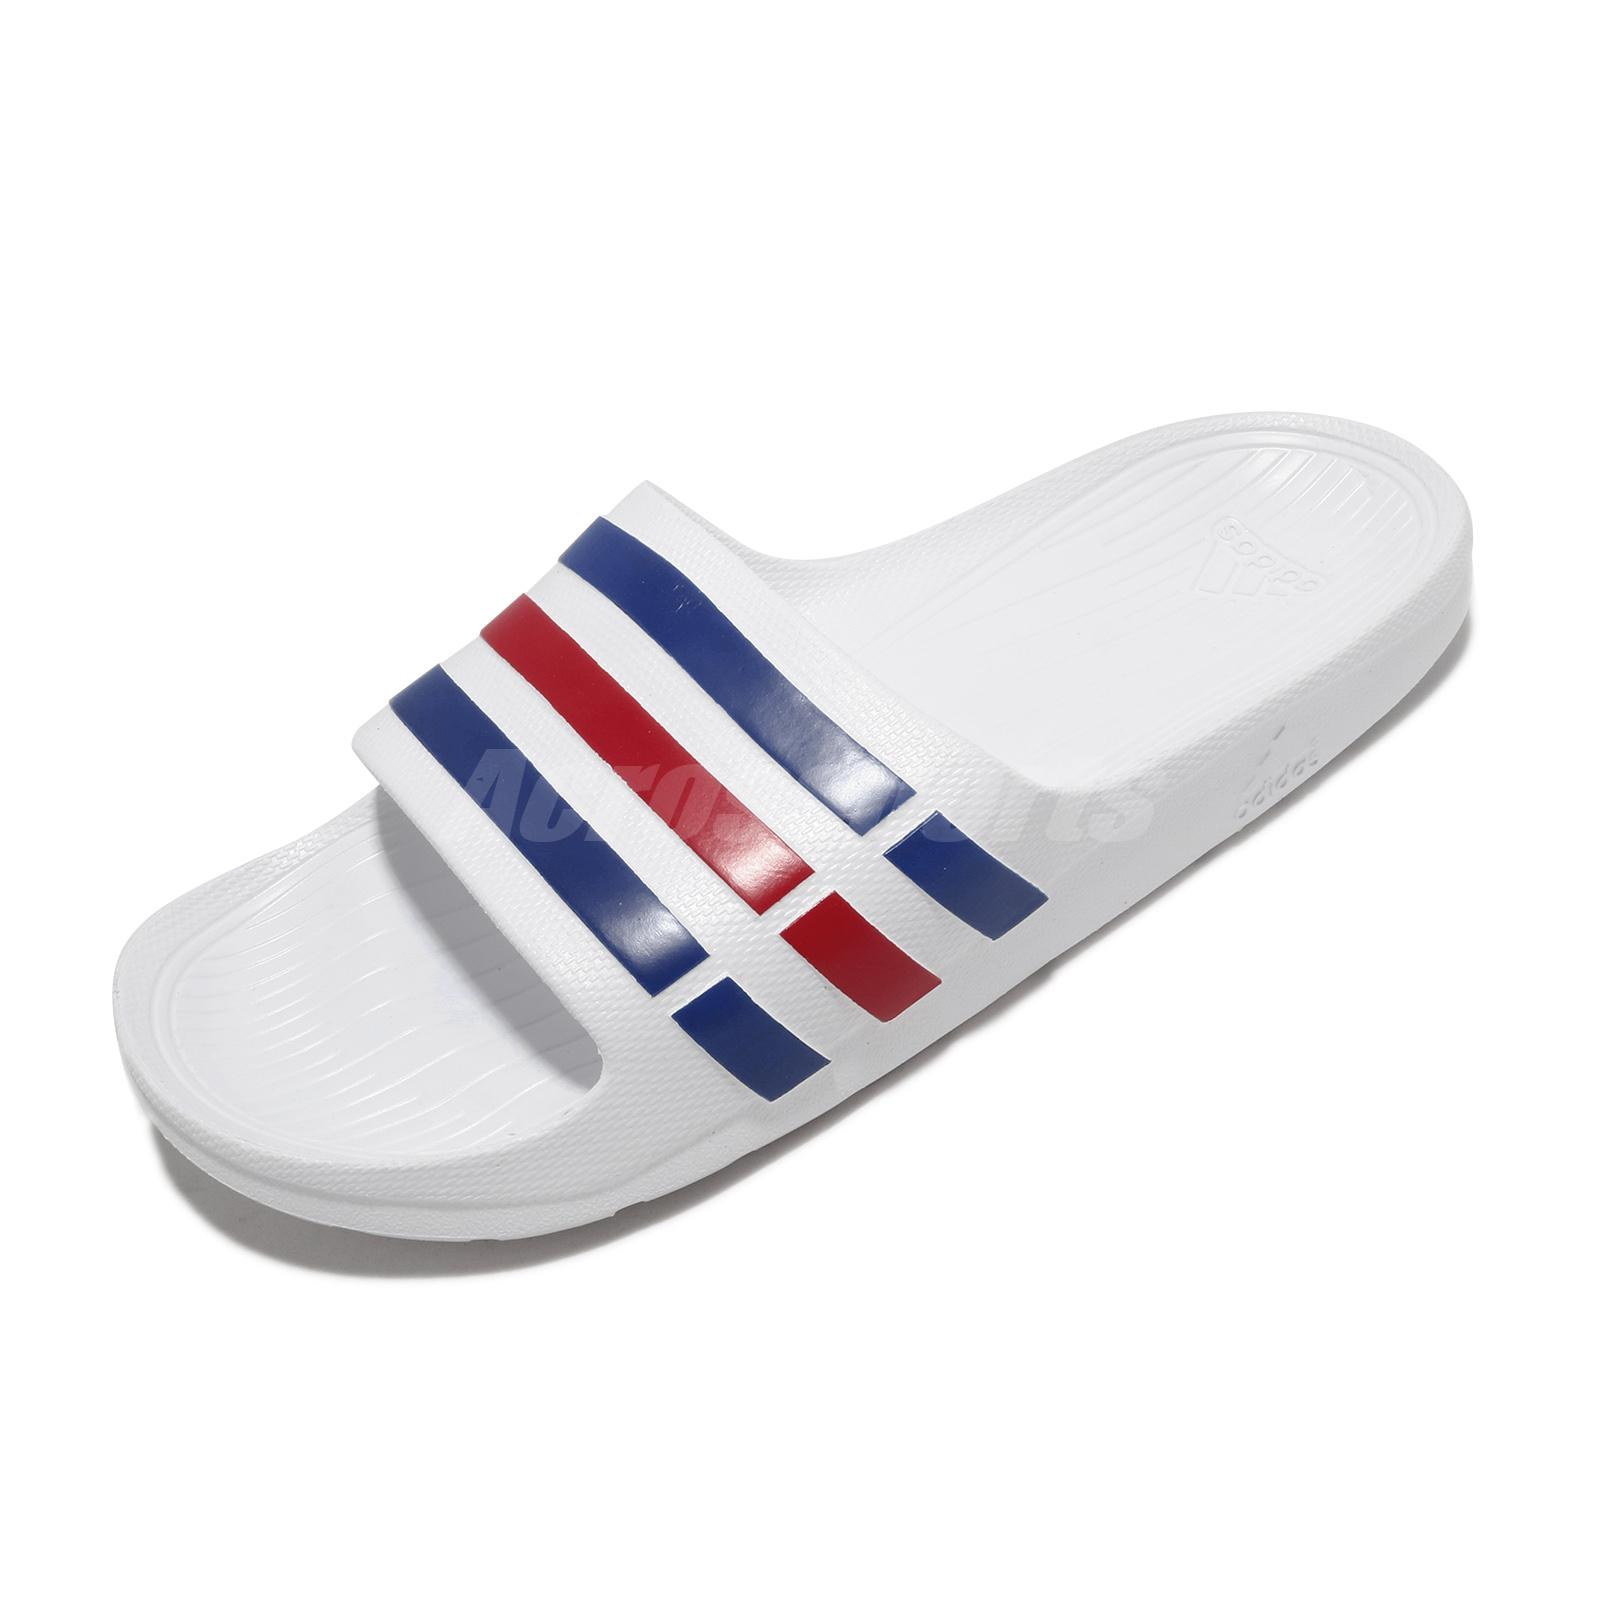 size 40 cc8d9 debcf adidas Duramo Slide White Blue Red Mens Womens Sports Slide Slippers U43664